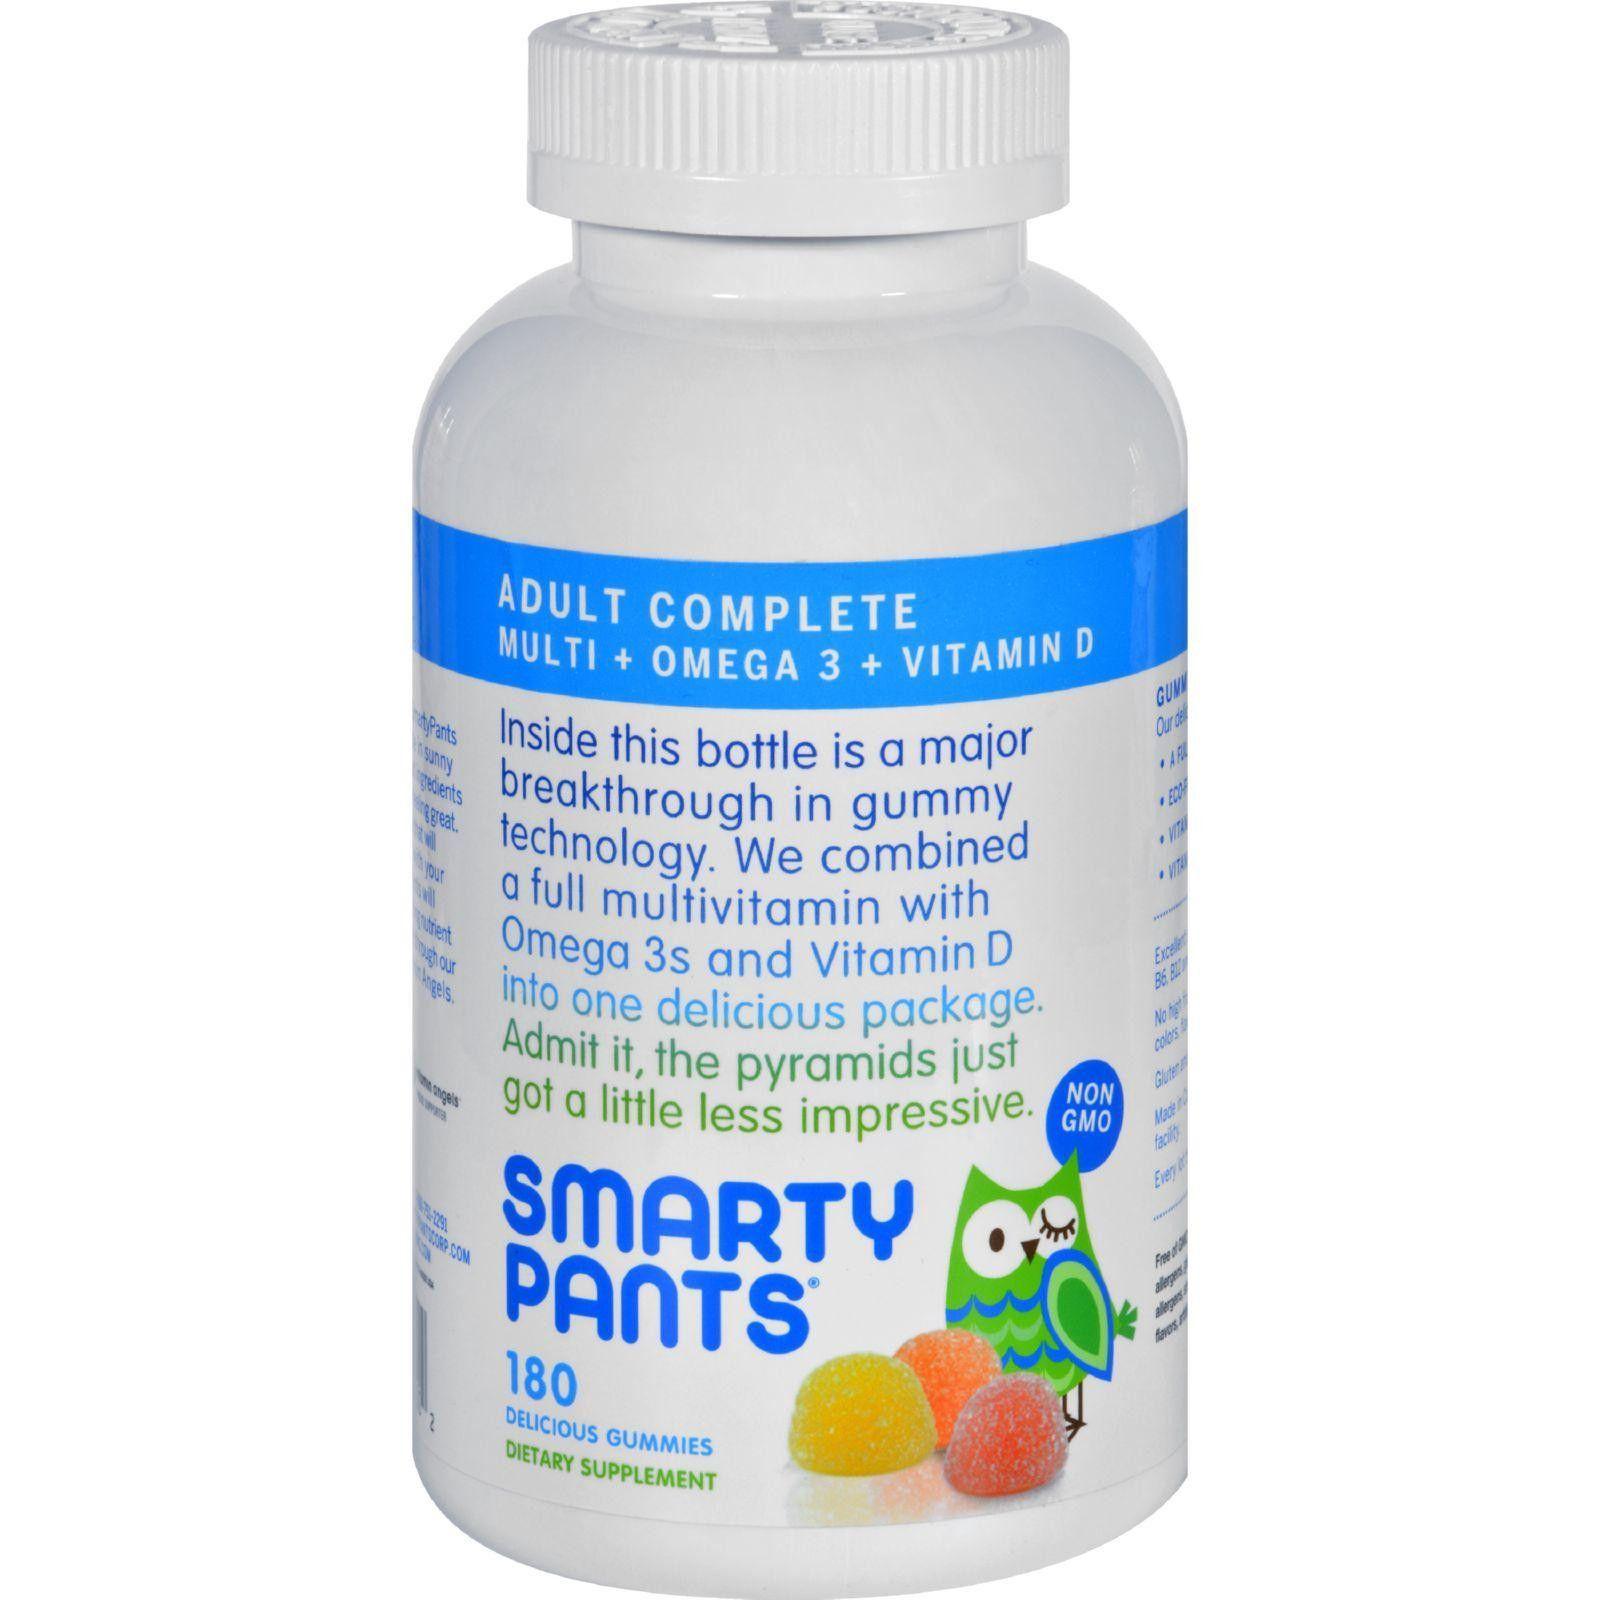 Smartypants All In One Multivitamin Plus Omega 3 Plus Vitamin D Gummies 180 Pack Multivitamin Vitamins Vitamin D